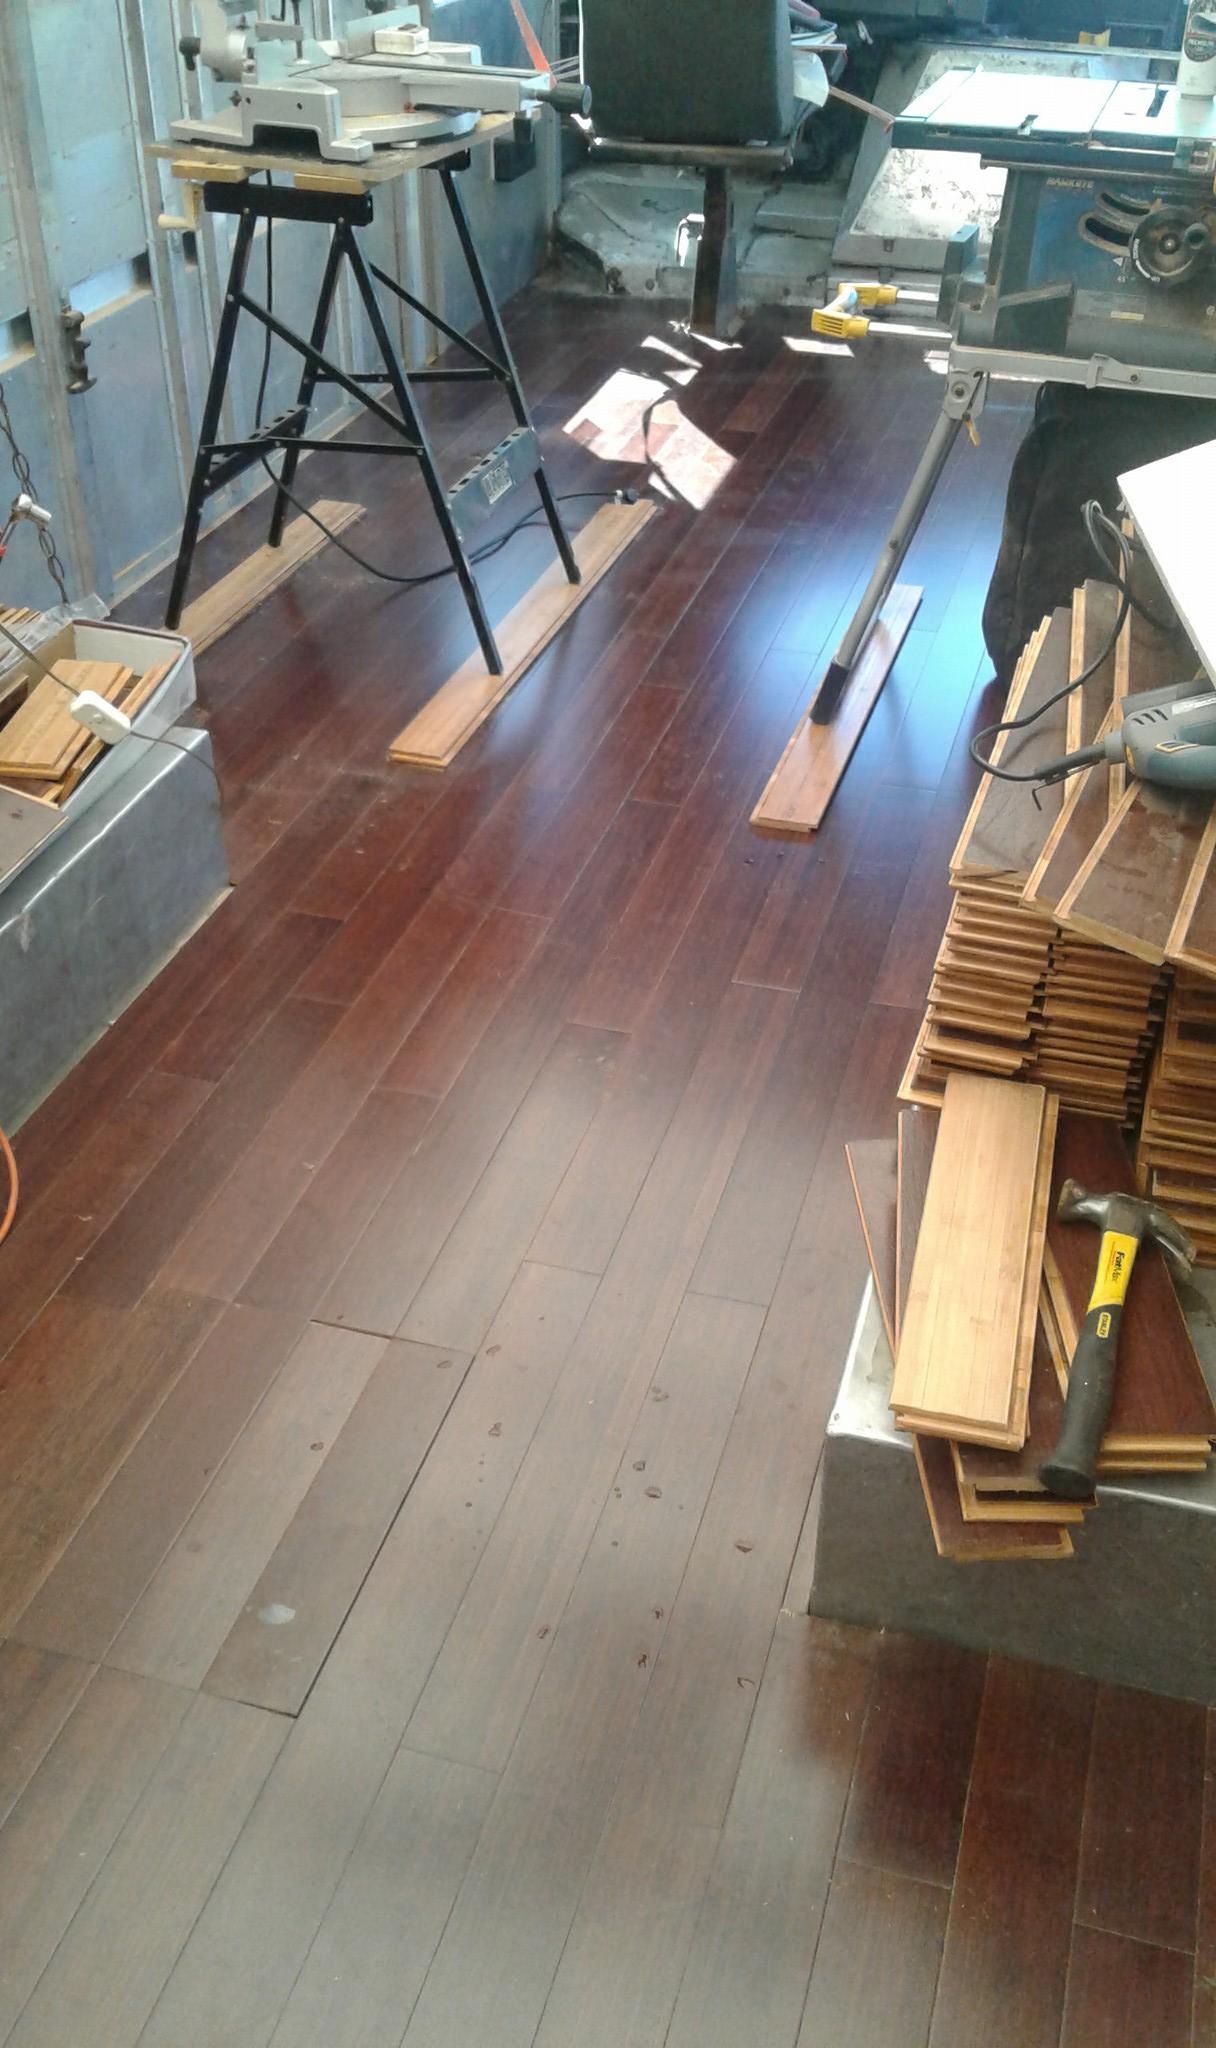 Reclaimed bamboo flooring? Don't mind if I do... -